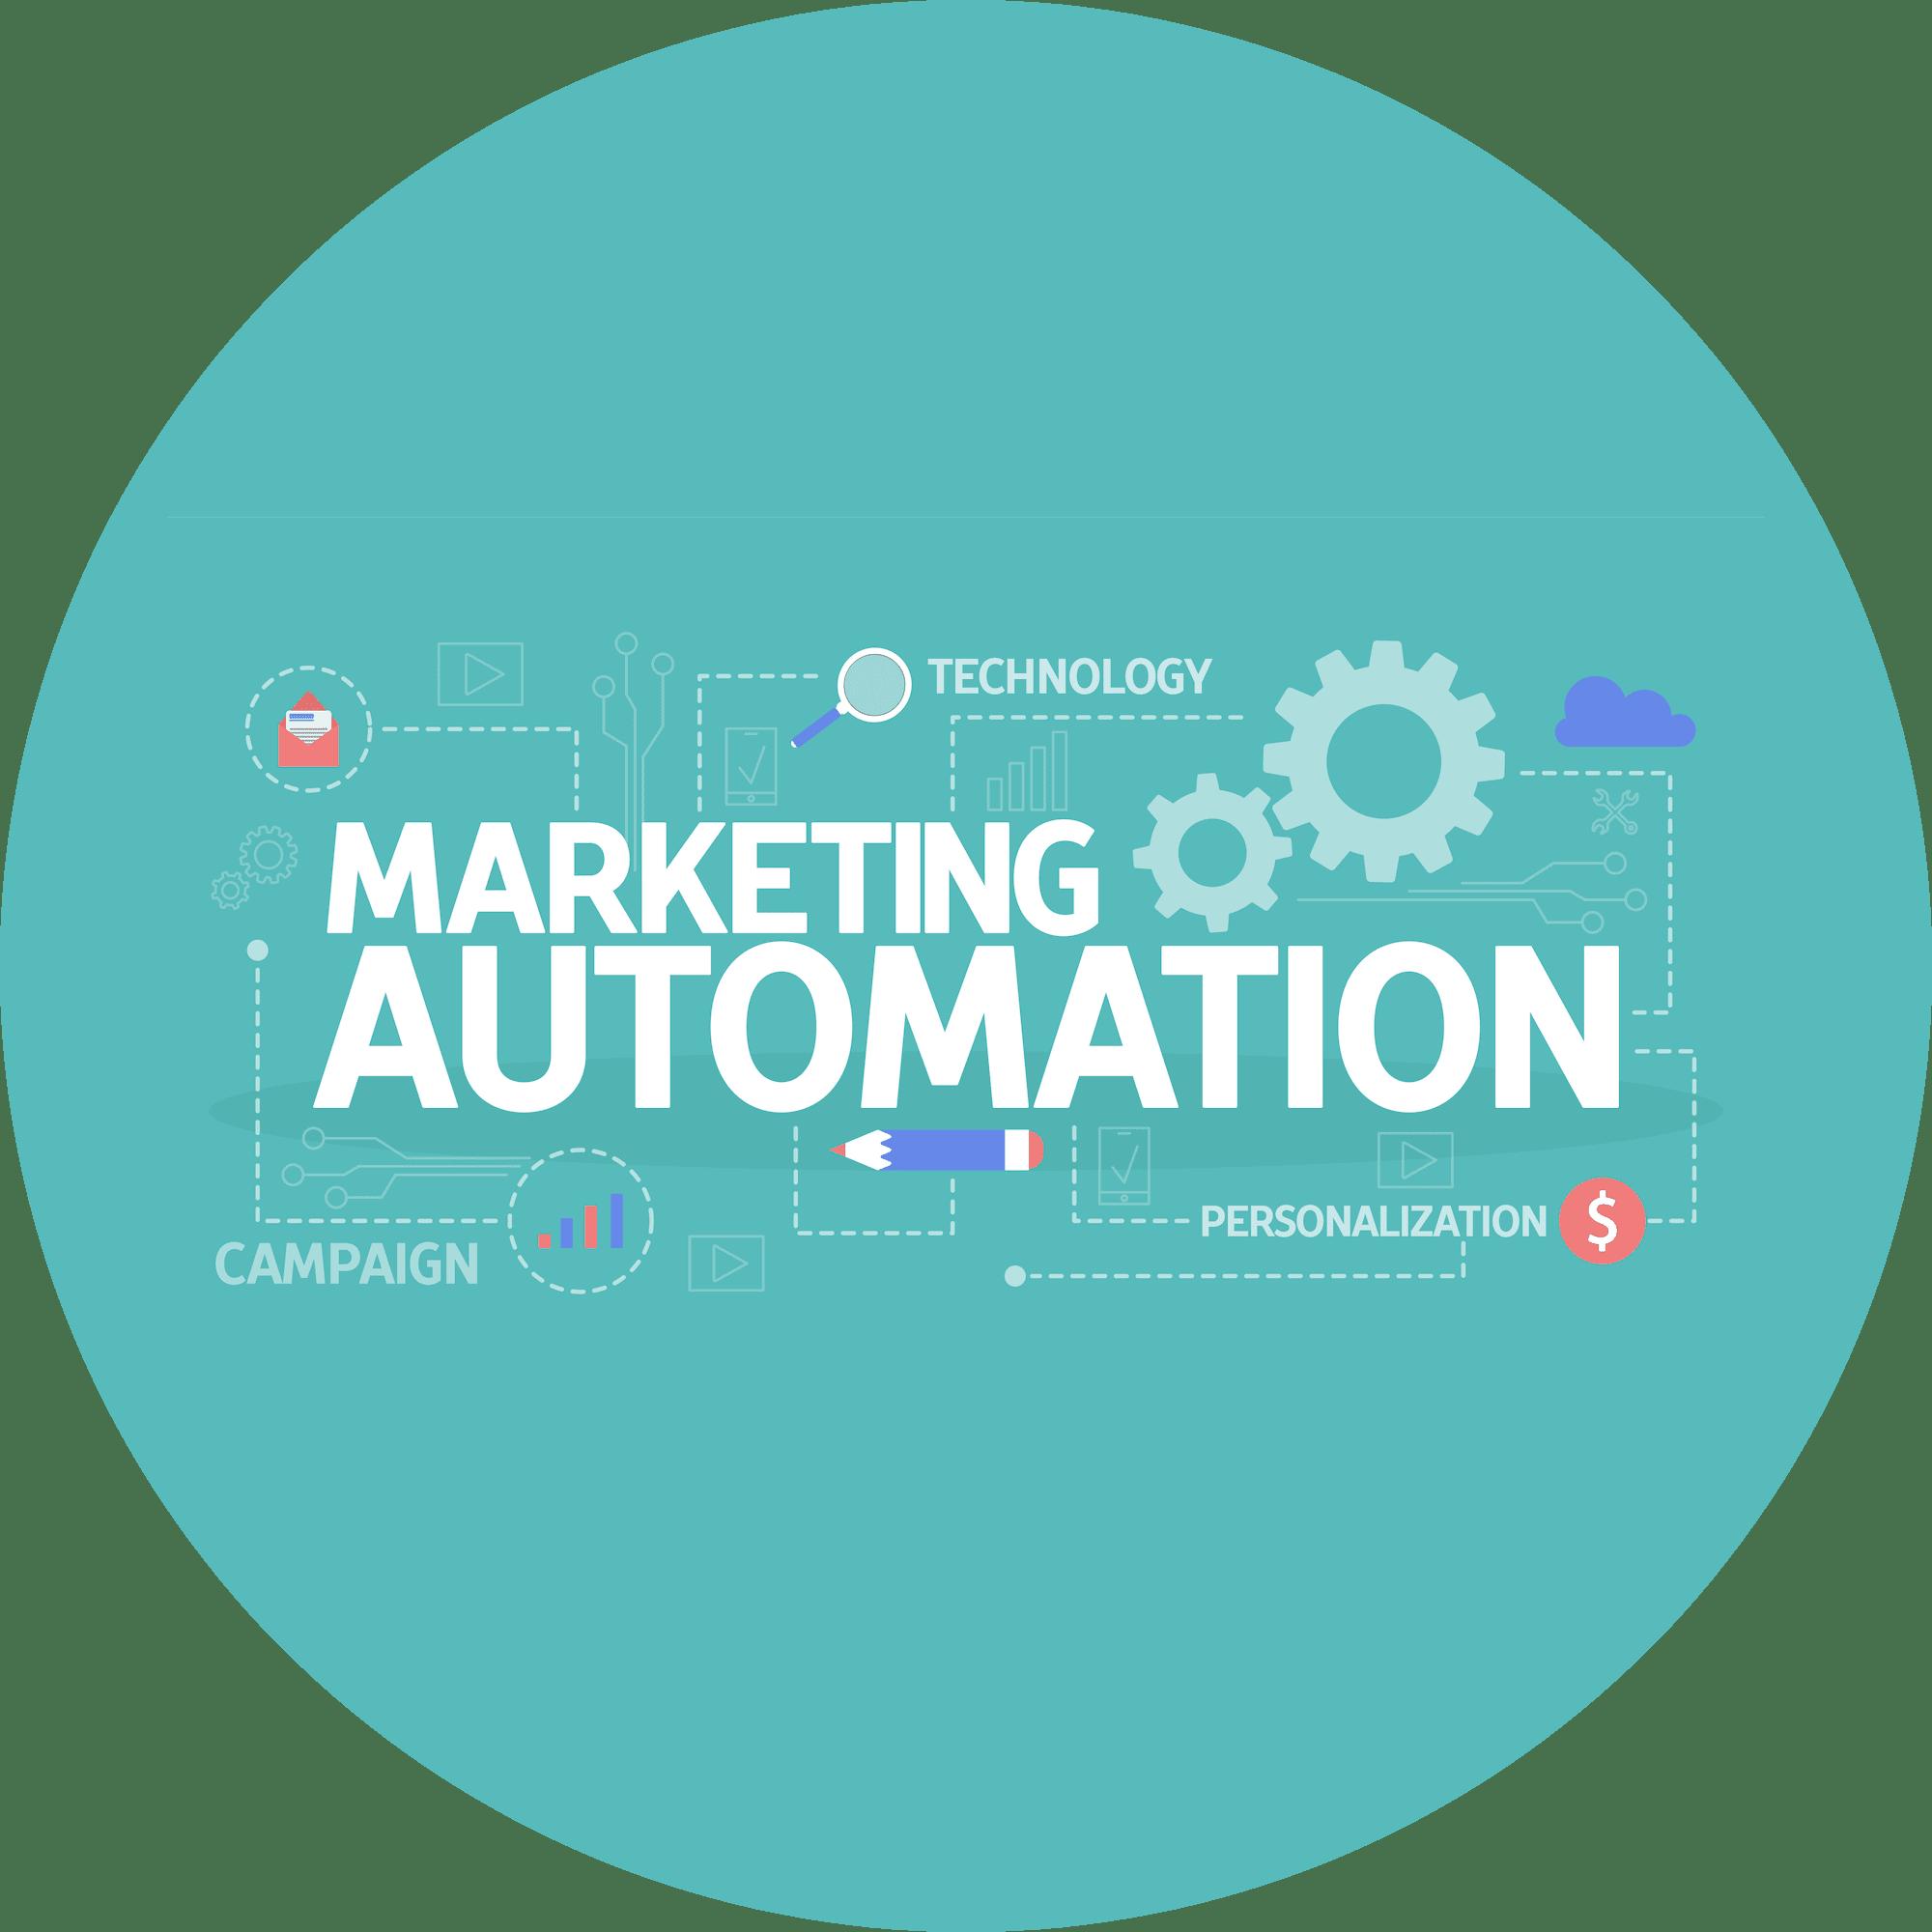 marketing and sales technology - webtrax